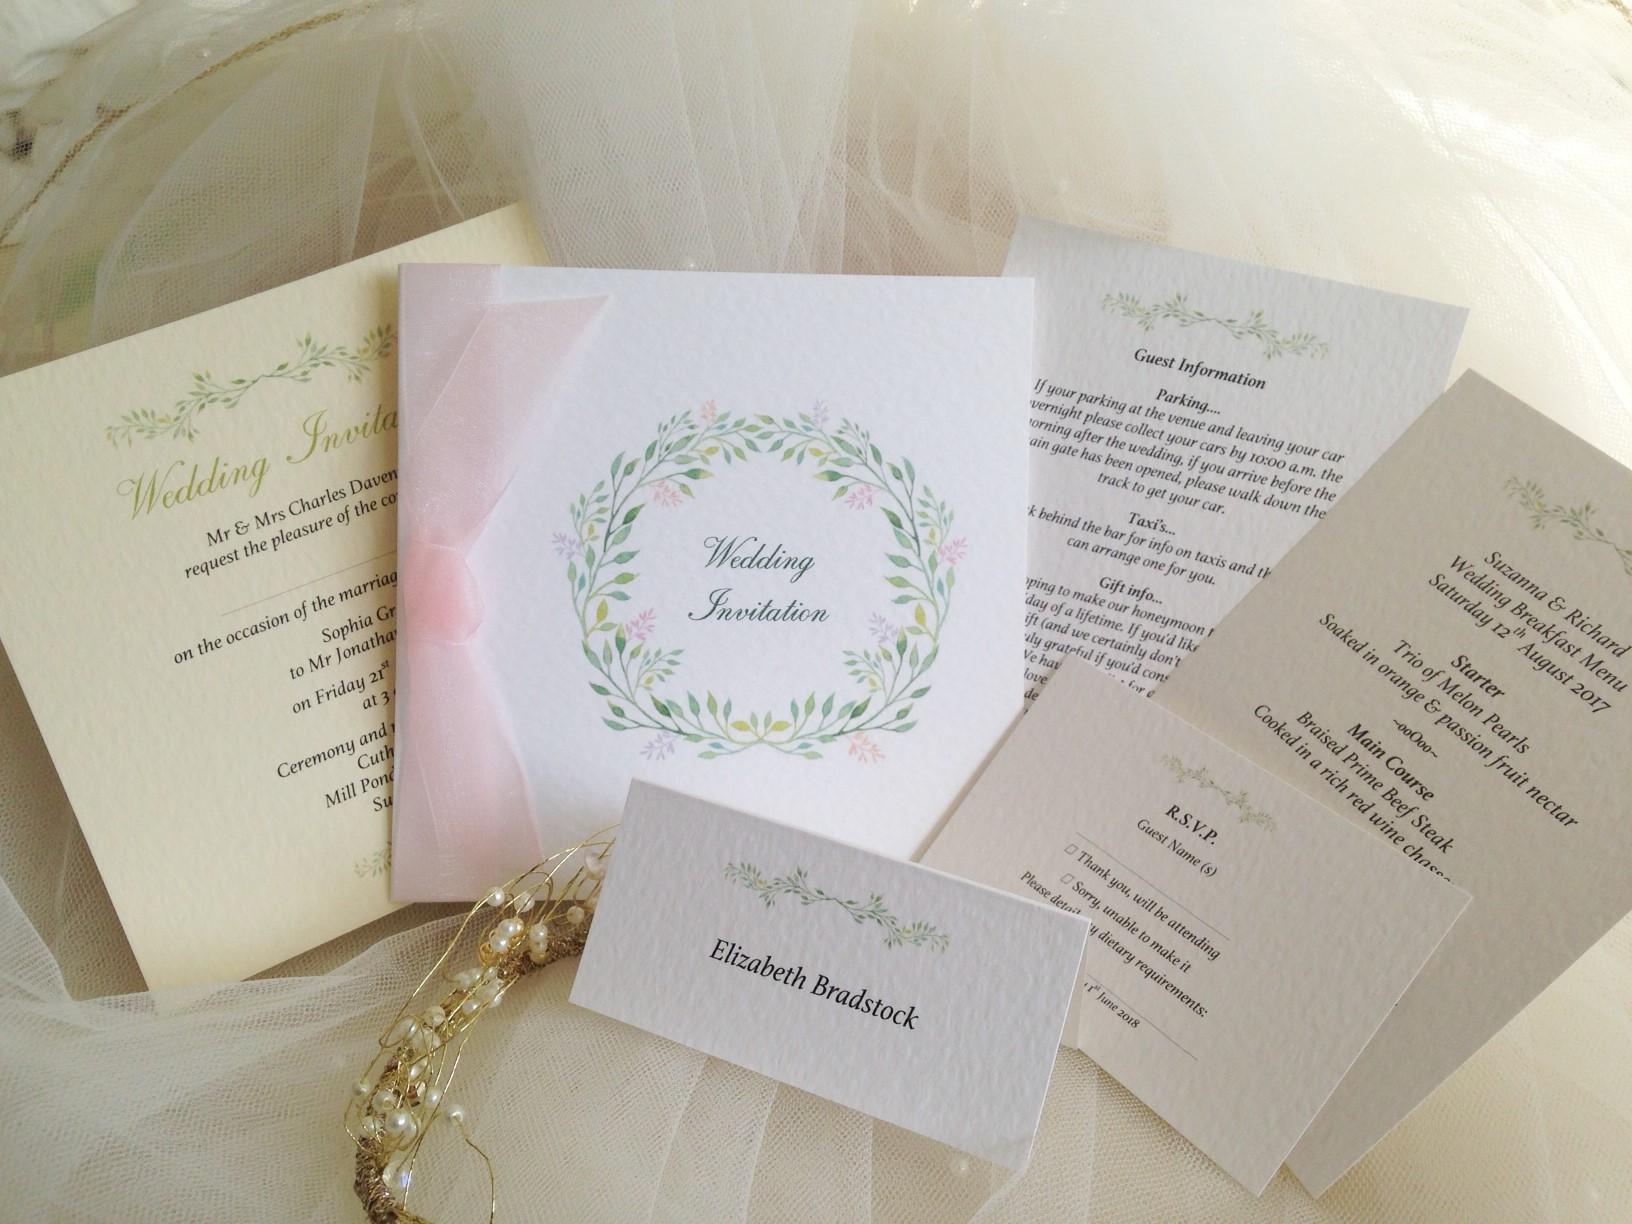 New Wedding Stationery Ranges - Daisy Chain Invites